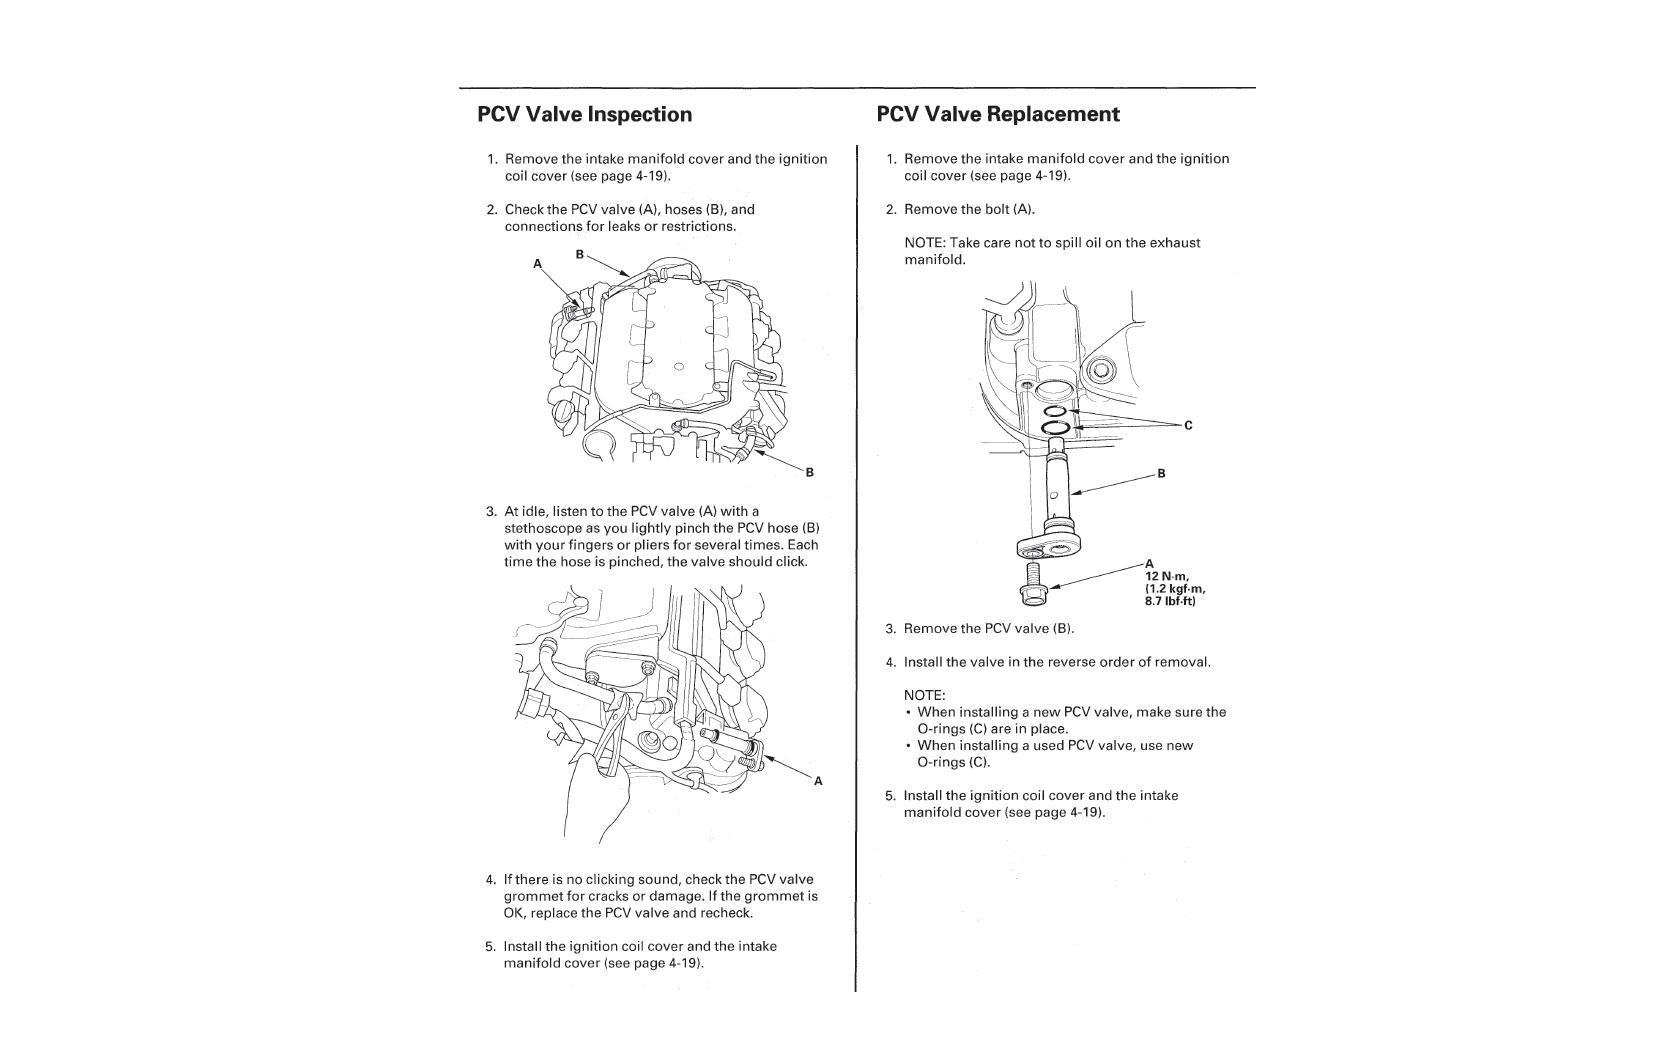 acura mdx maintenance schedule manual full version free software rh rutrackerdirectory weebly com 2001 Acura MDX Silver Honda Acura MDX 2002